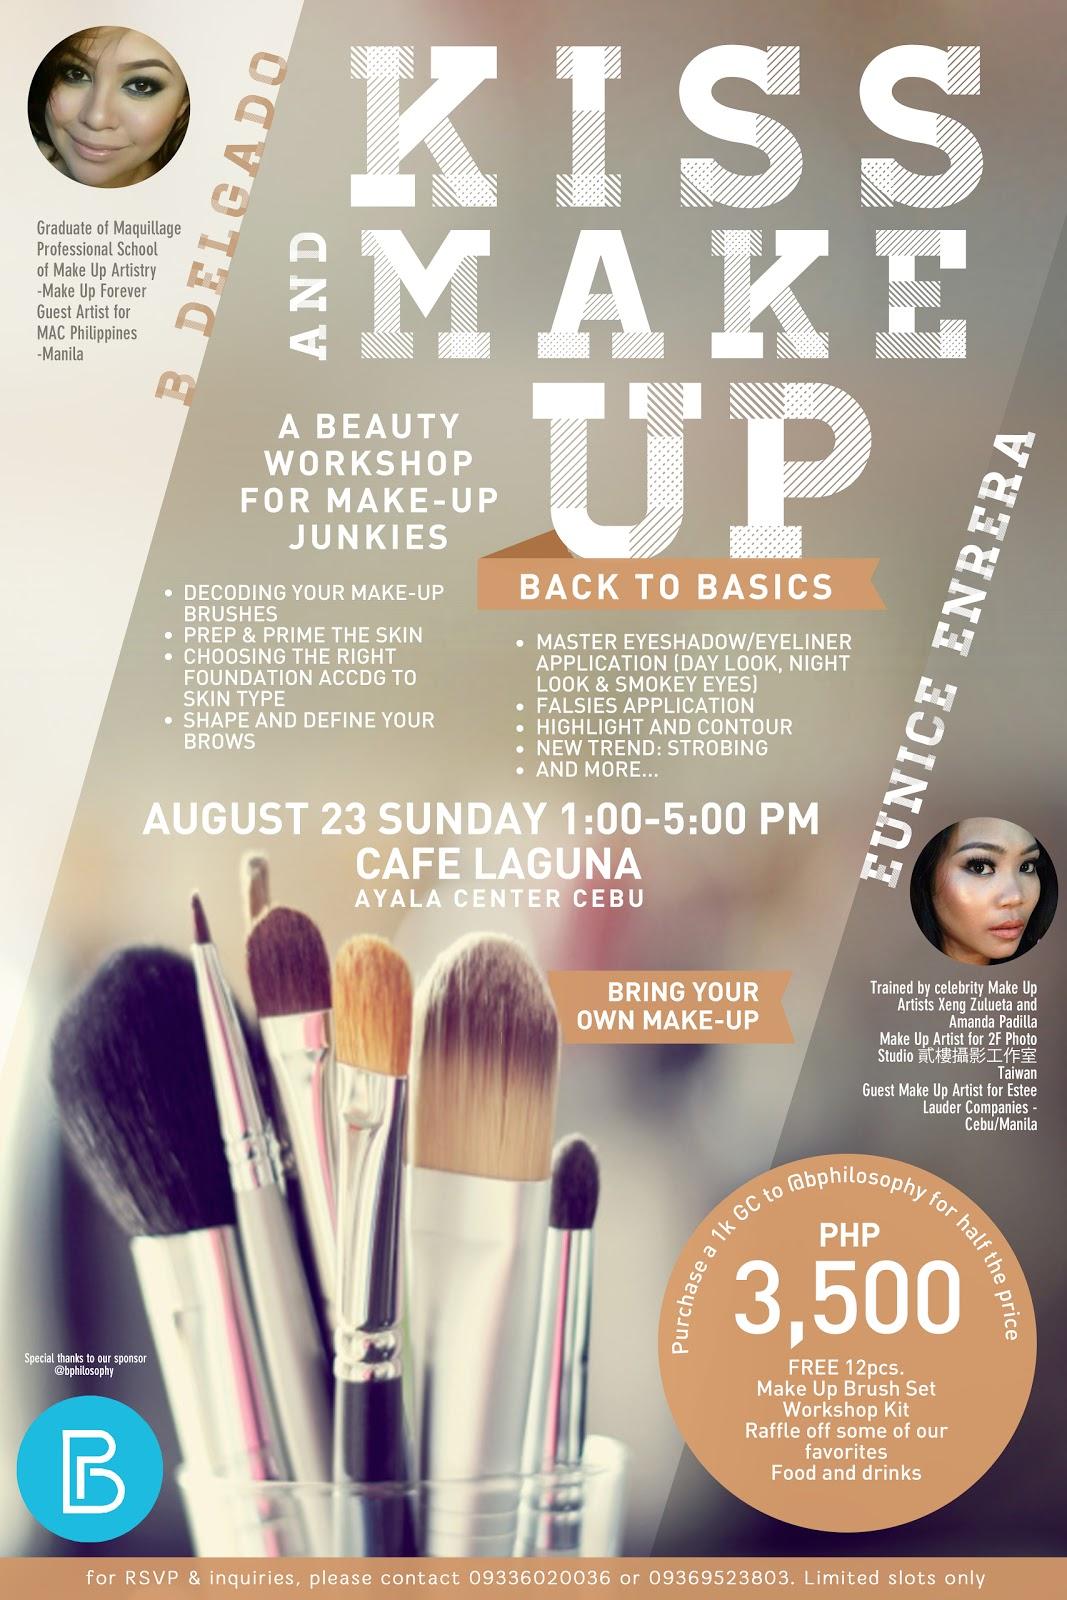 Cebu Fashion Bloggers, Cebu Bloggers, Fashion Bloggers, Lifestyle Bloggers, Makeup  Workshops, Cebu Workshops, Cebu Makeup Workshops, Cebu Makeup Artists, Cebu Beauty Bloggers, Beauty BLoggers, Kiss and Makeup Workshop Cebu